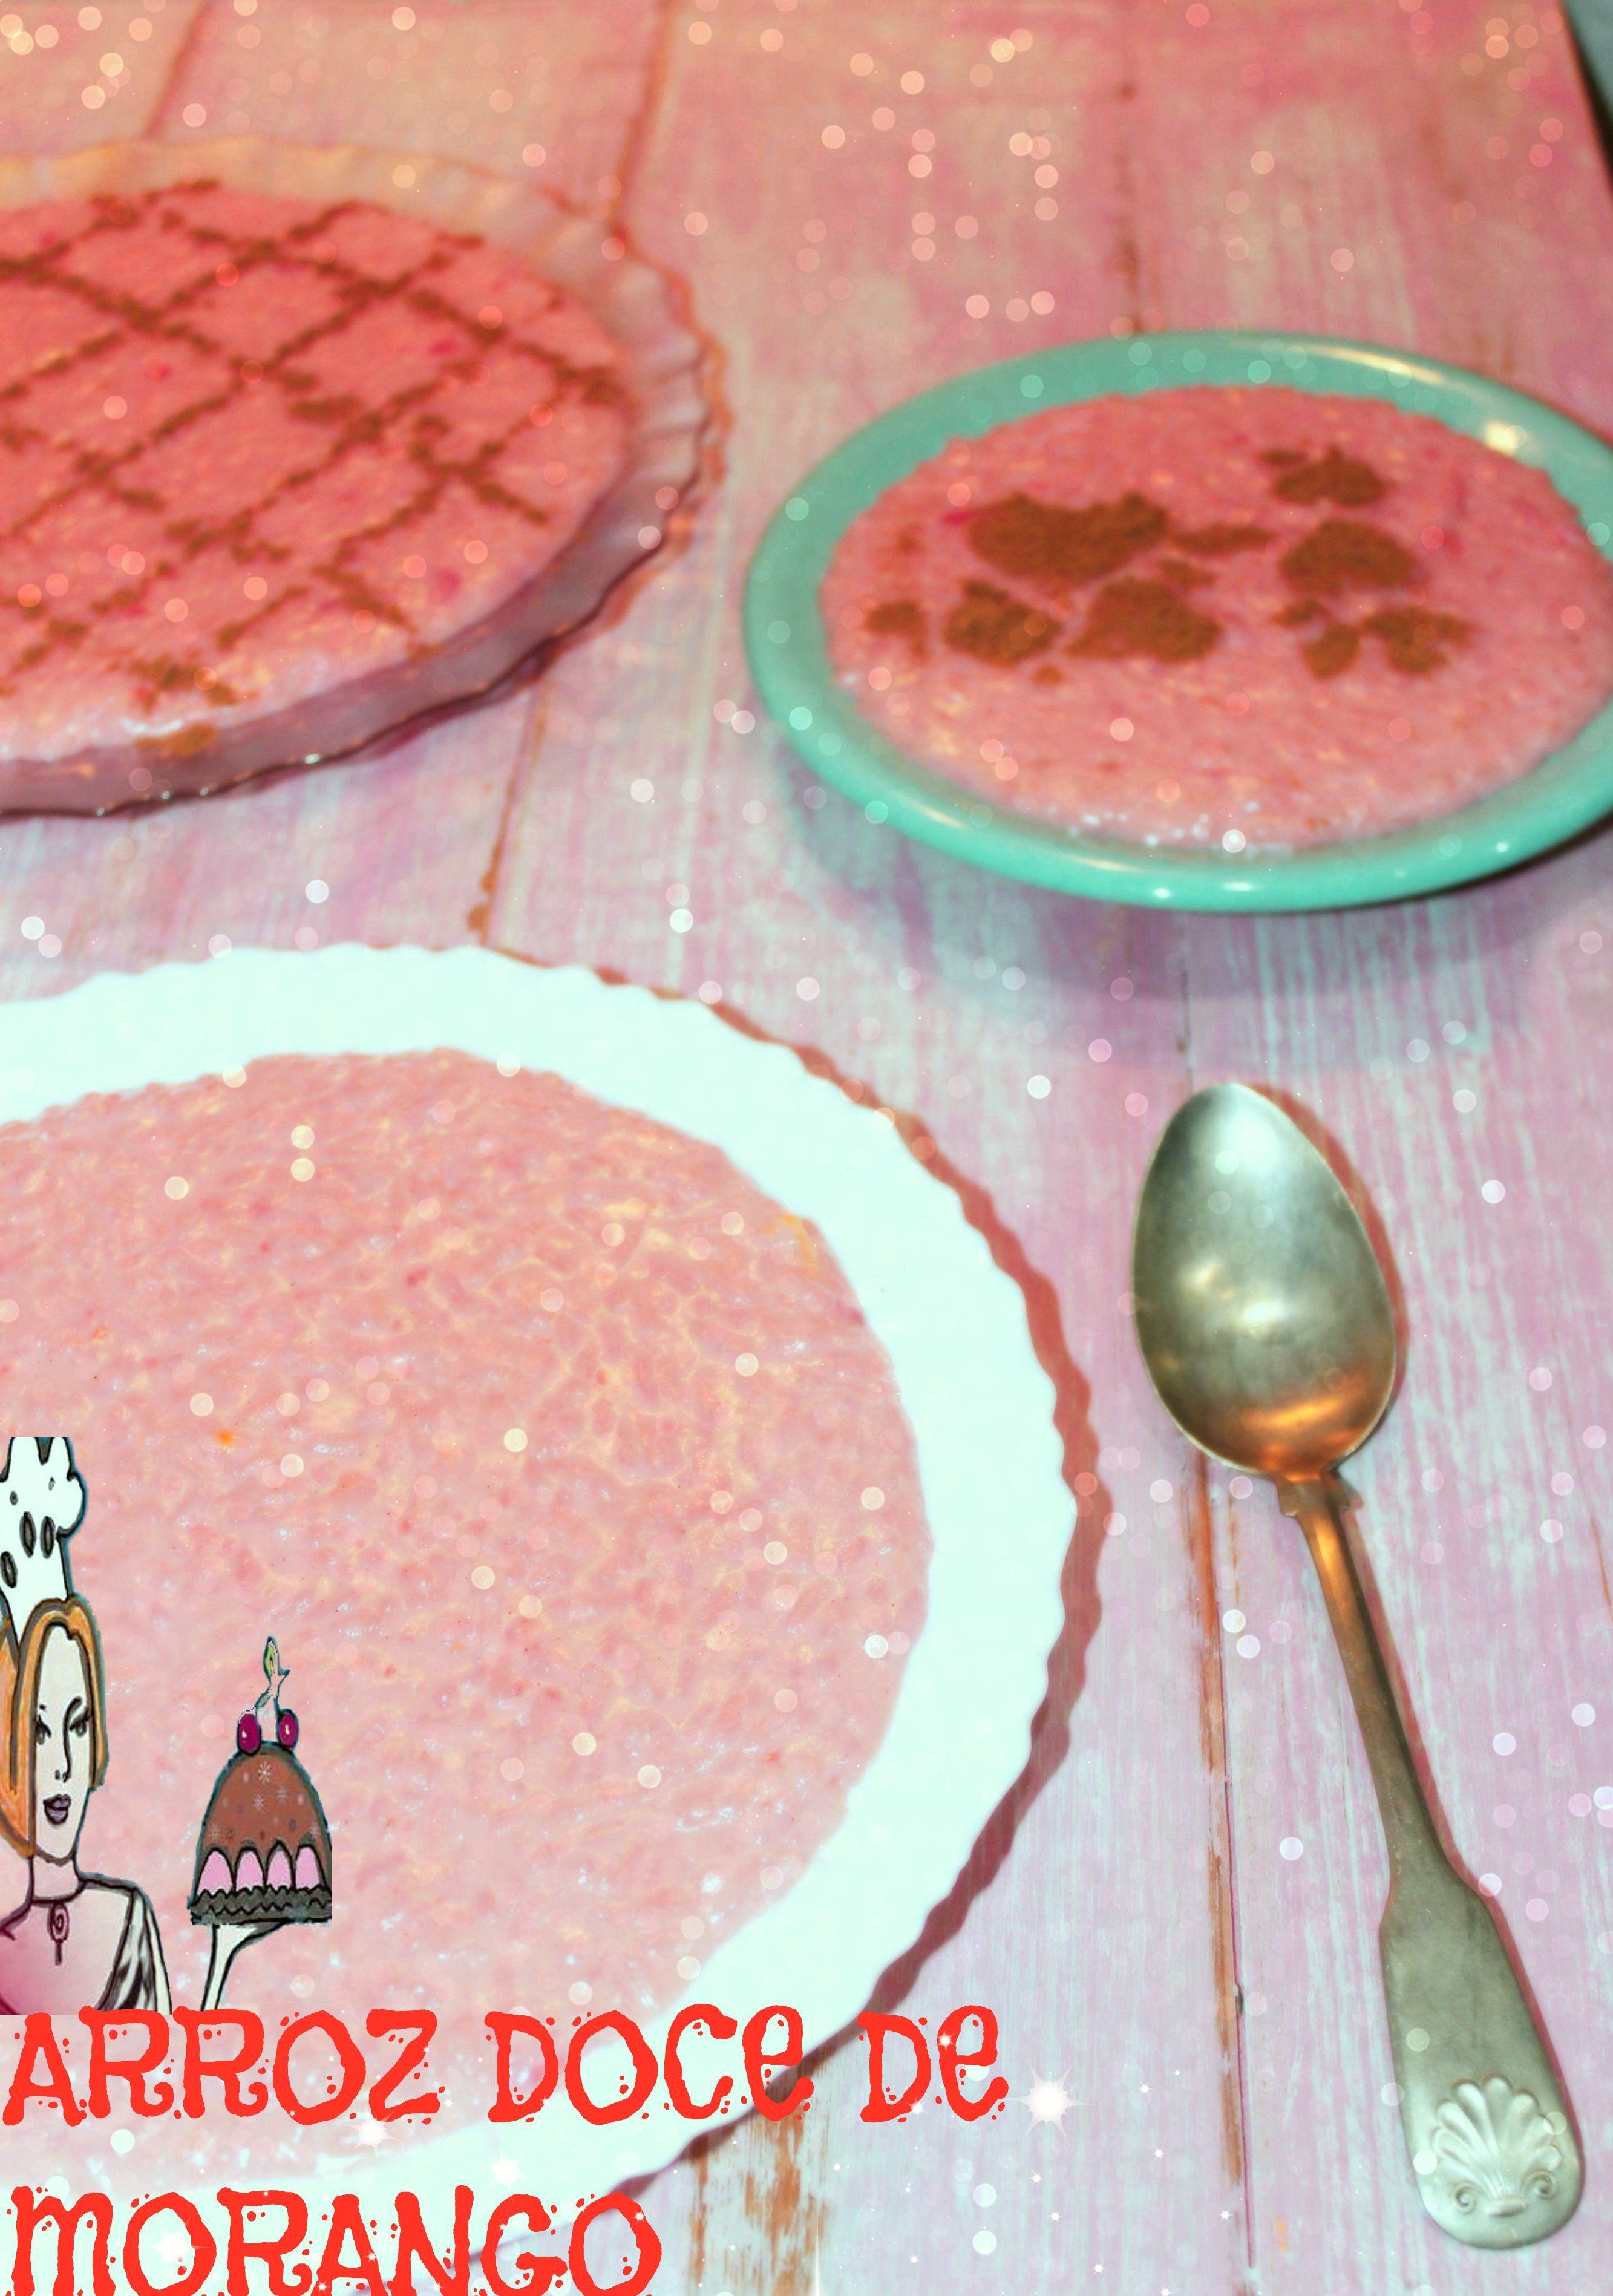 http://www.receitasfaceisrapidasesaborosas.pt/arroz-doce-de-morango-368357